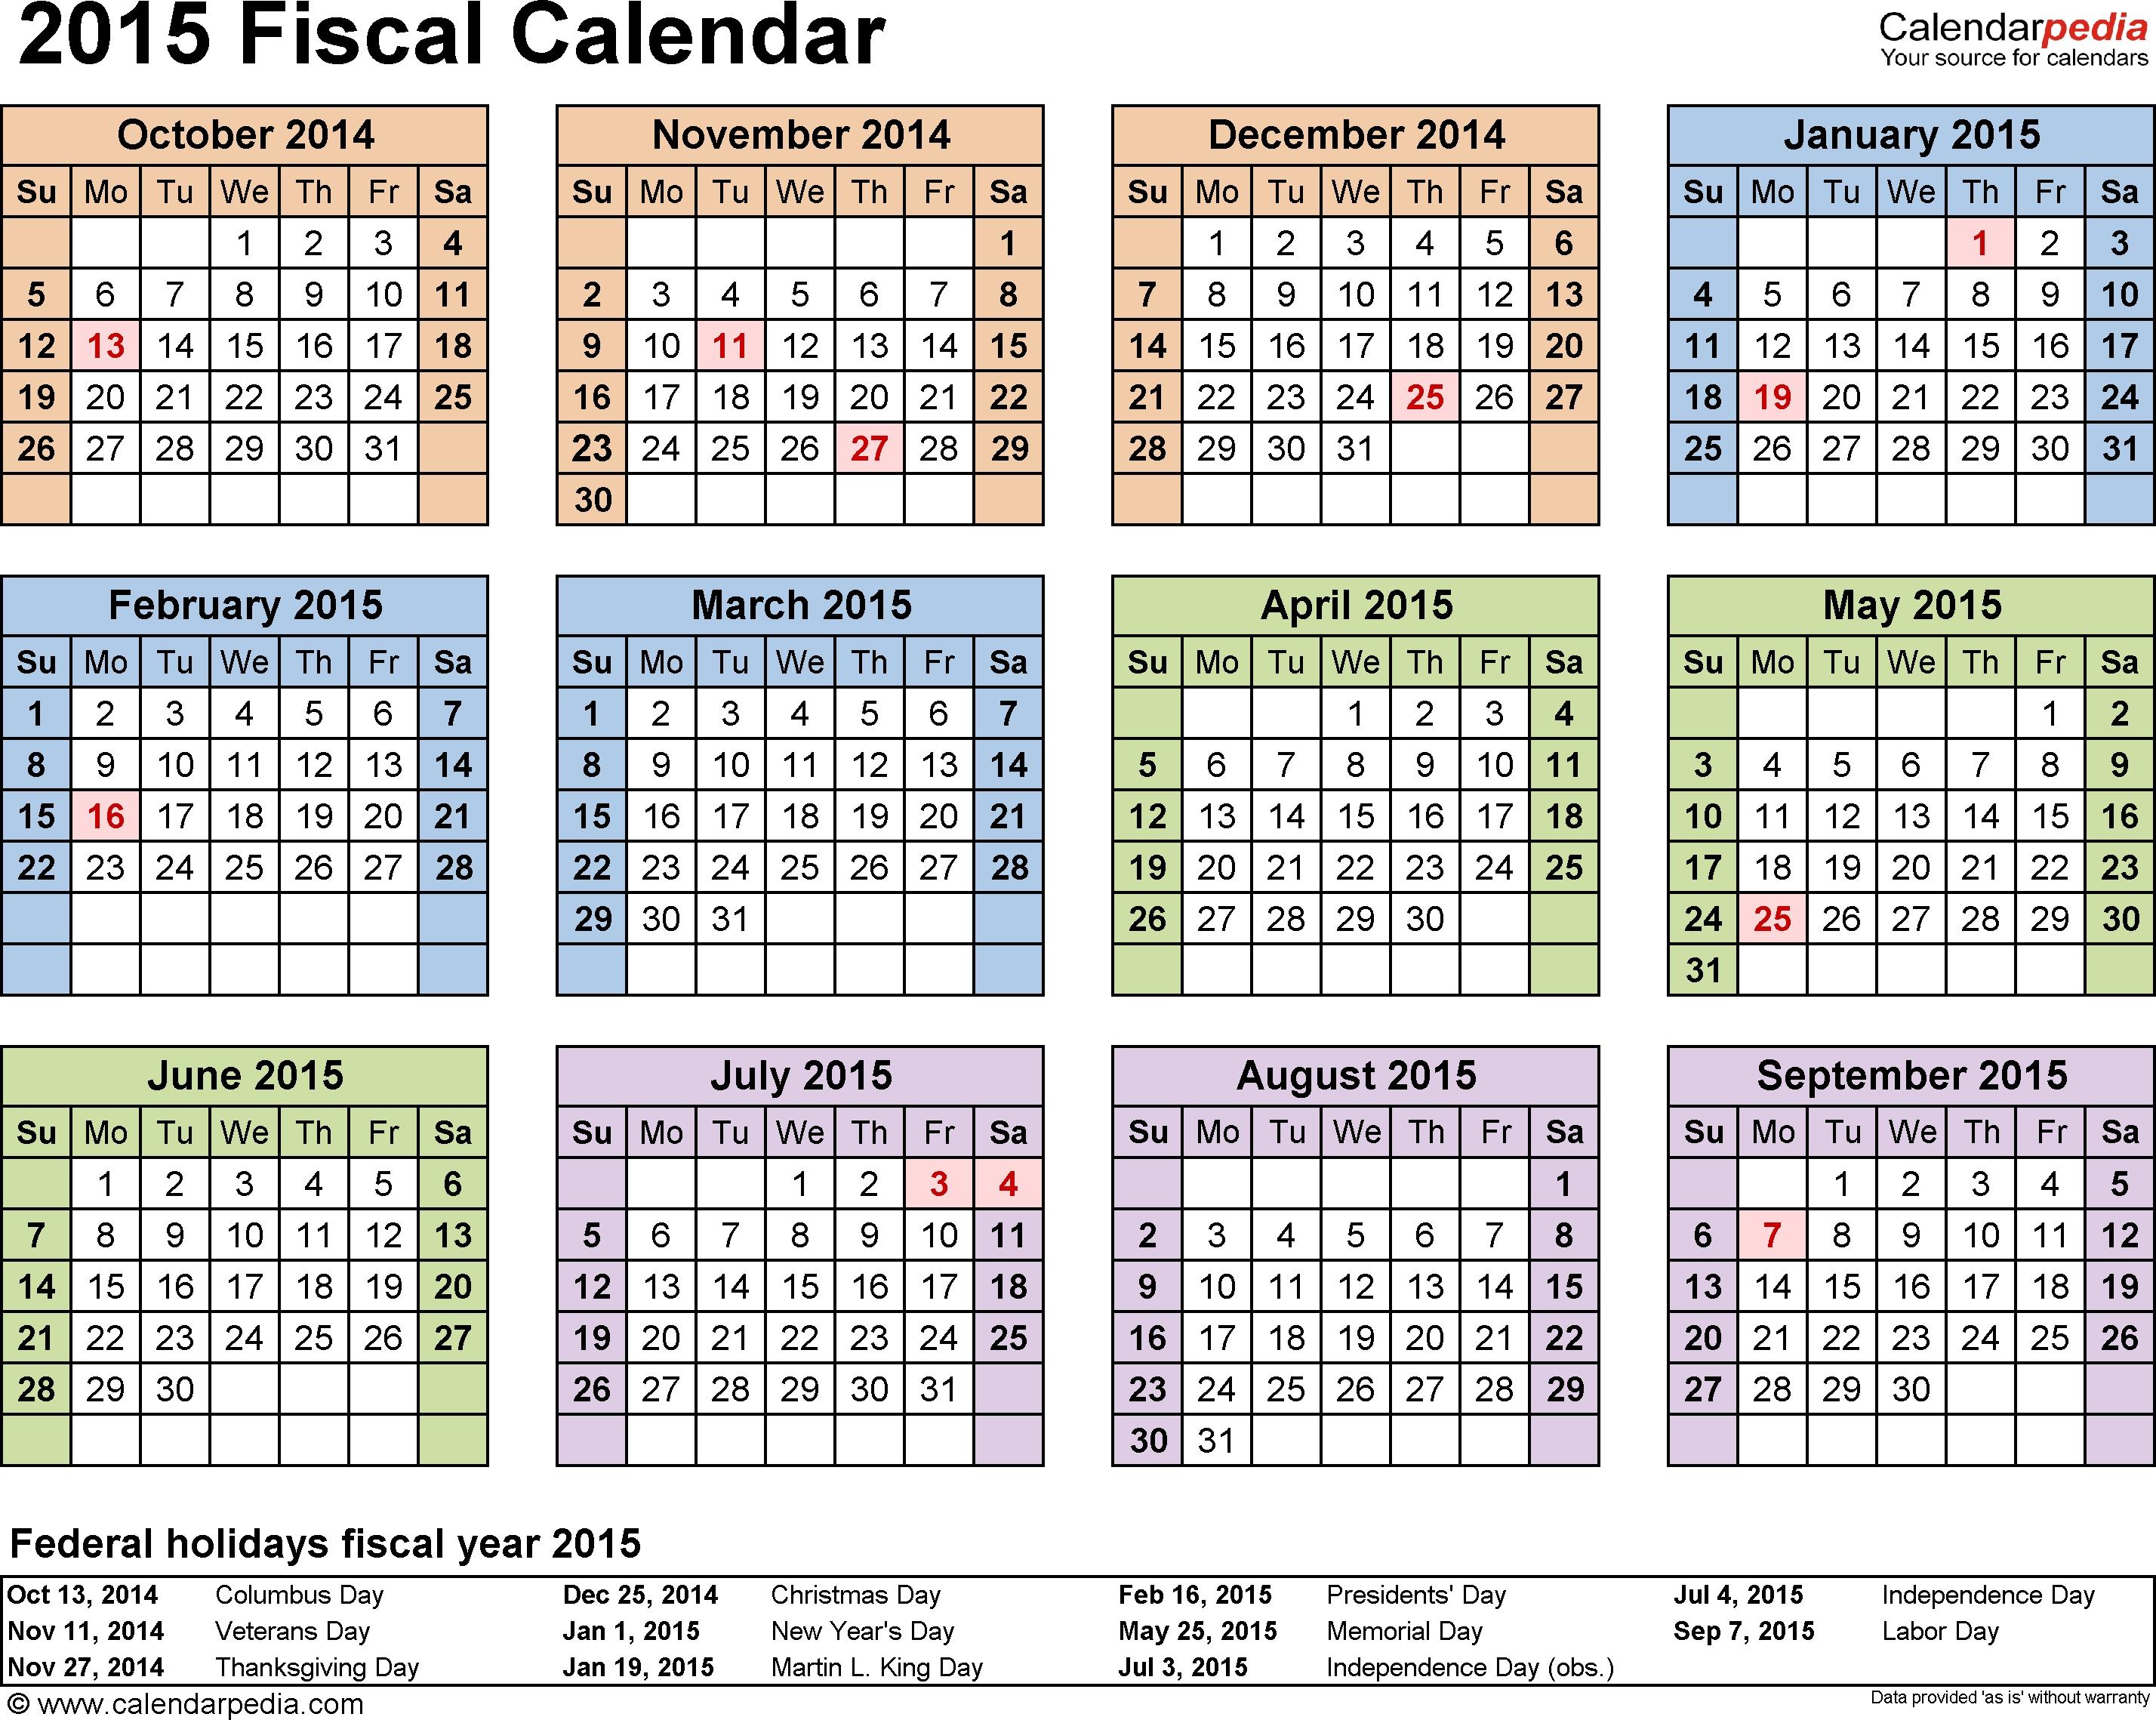 Fiscal Year Calendar 2015 - Yeniscale.co  Fiscal Year Vs Calendar Year